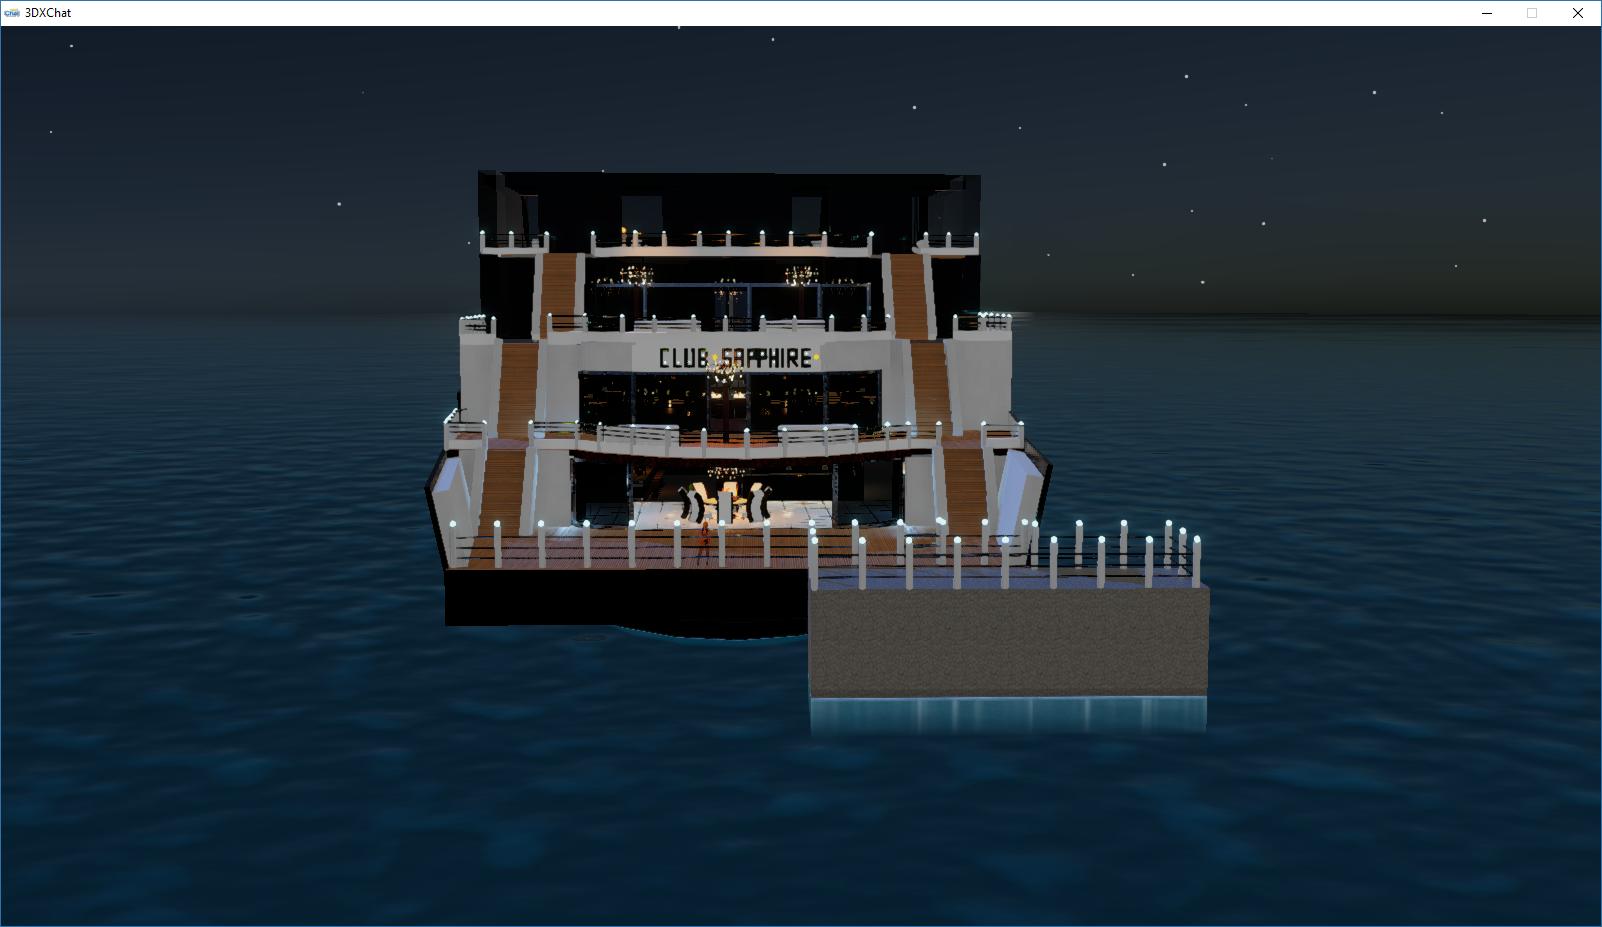 yacht40ts8e.png